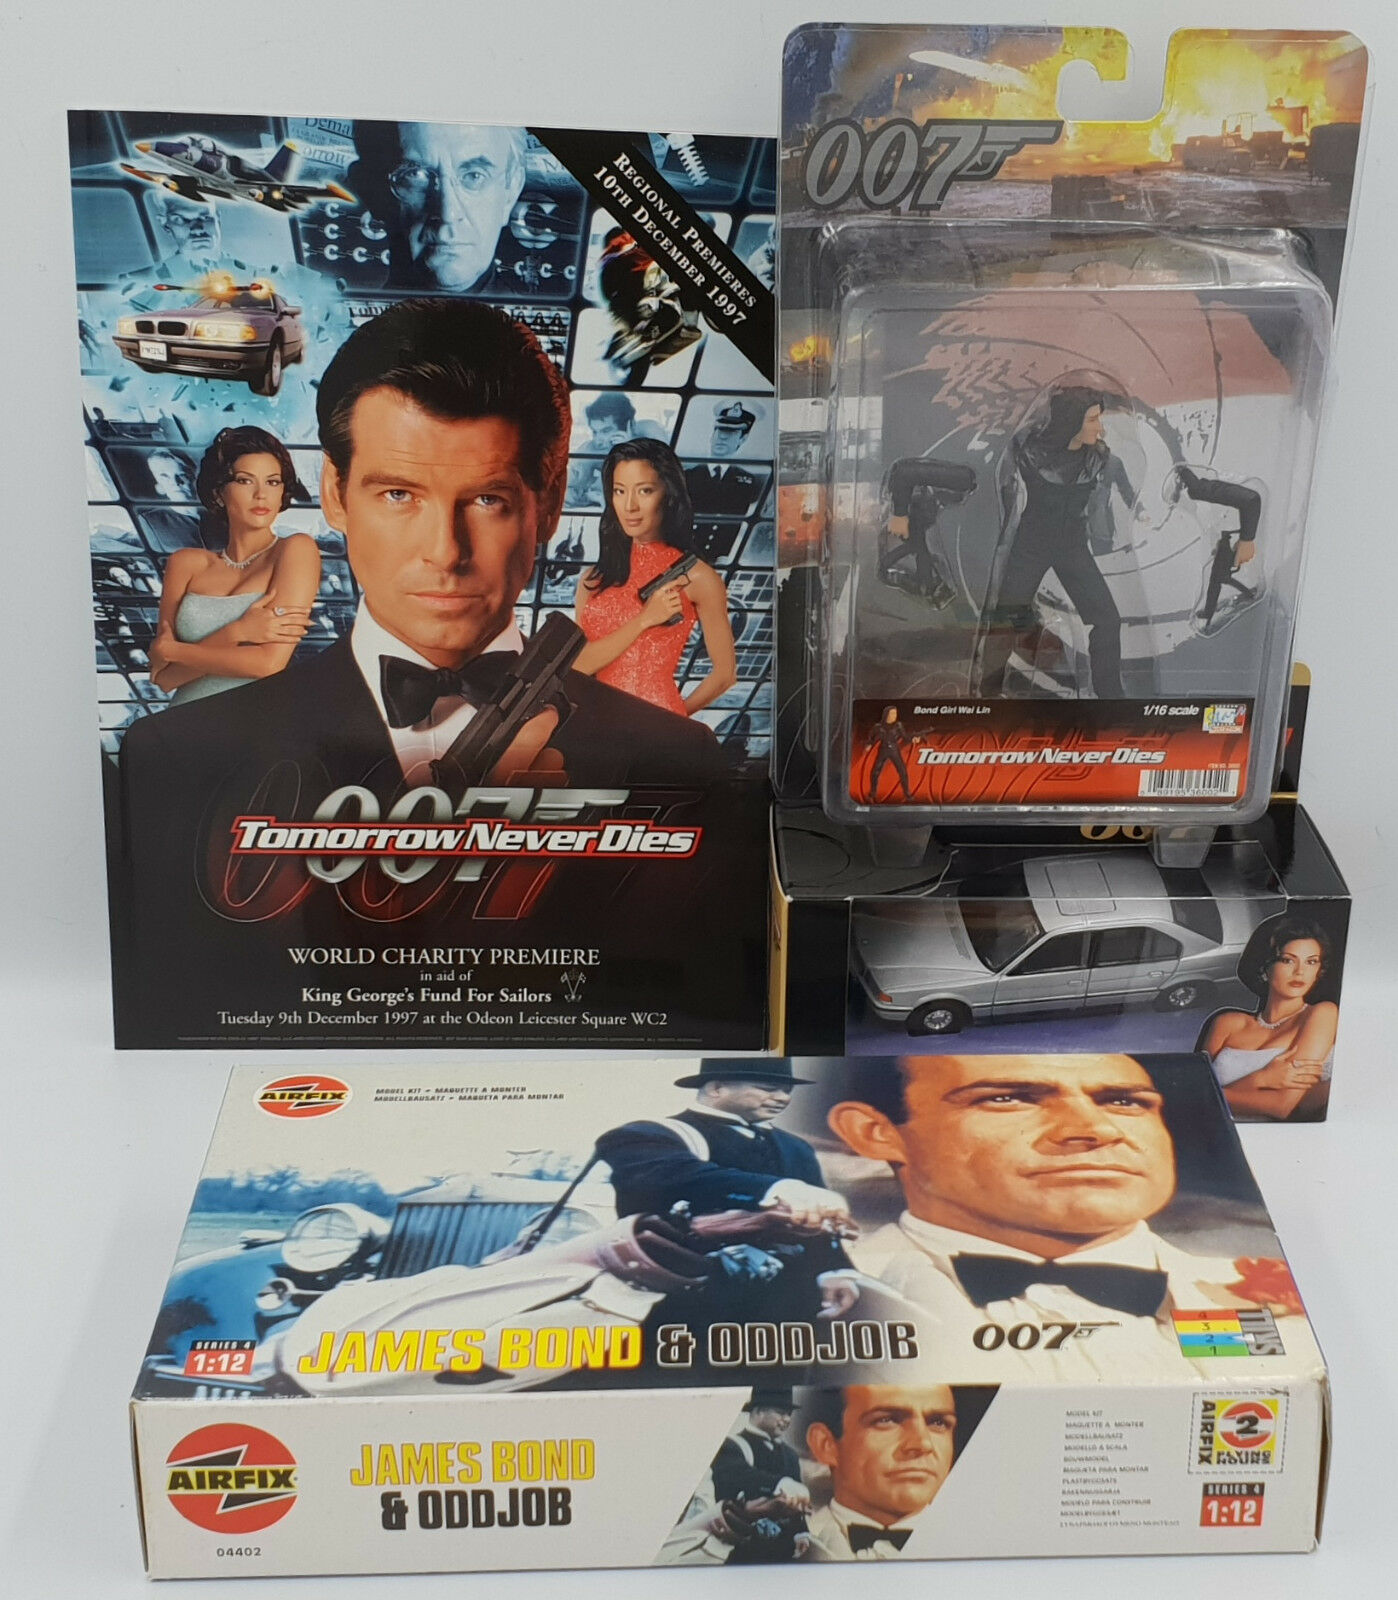 James BOND: Wai LIN, BMW 750I, Odd Job, James Bond, Pellicola Premiere progamme Set